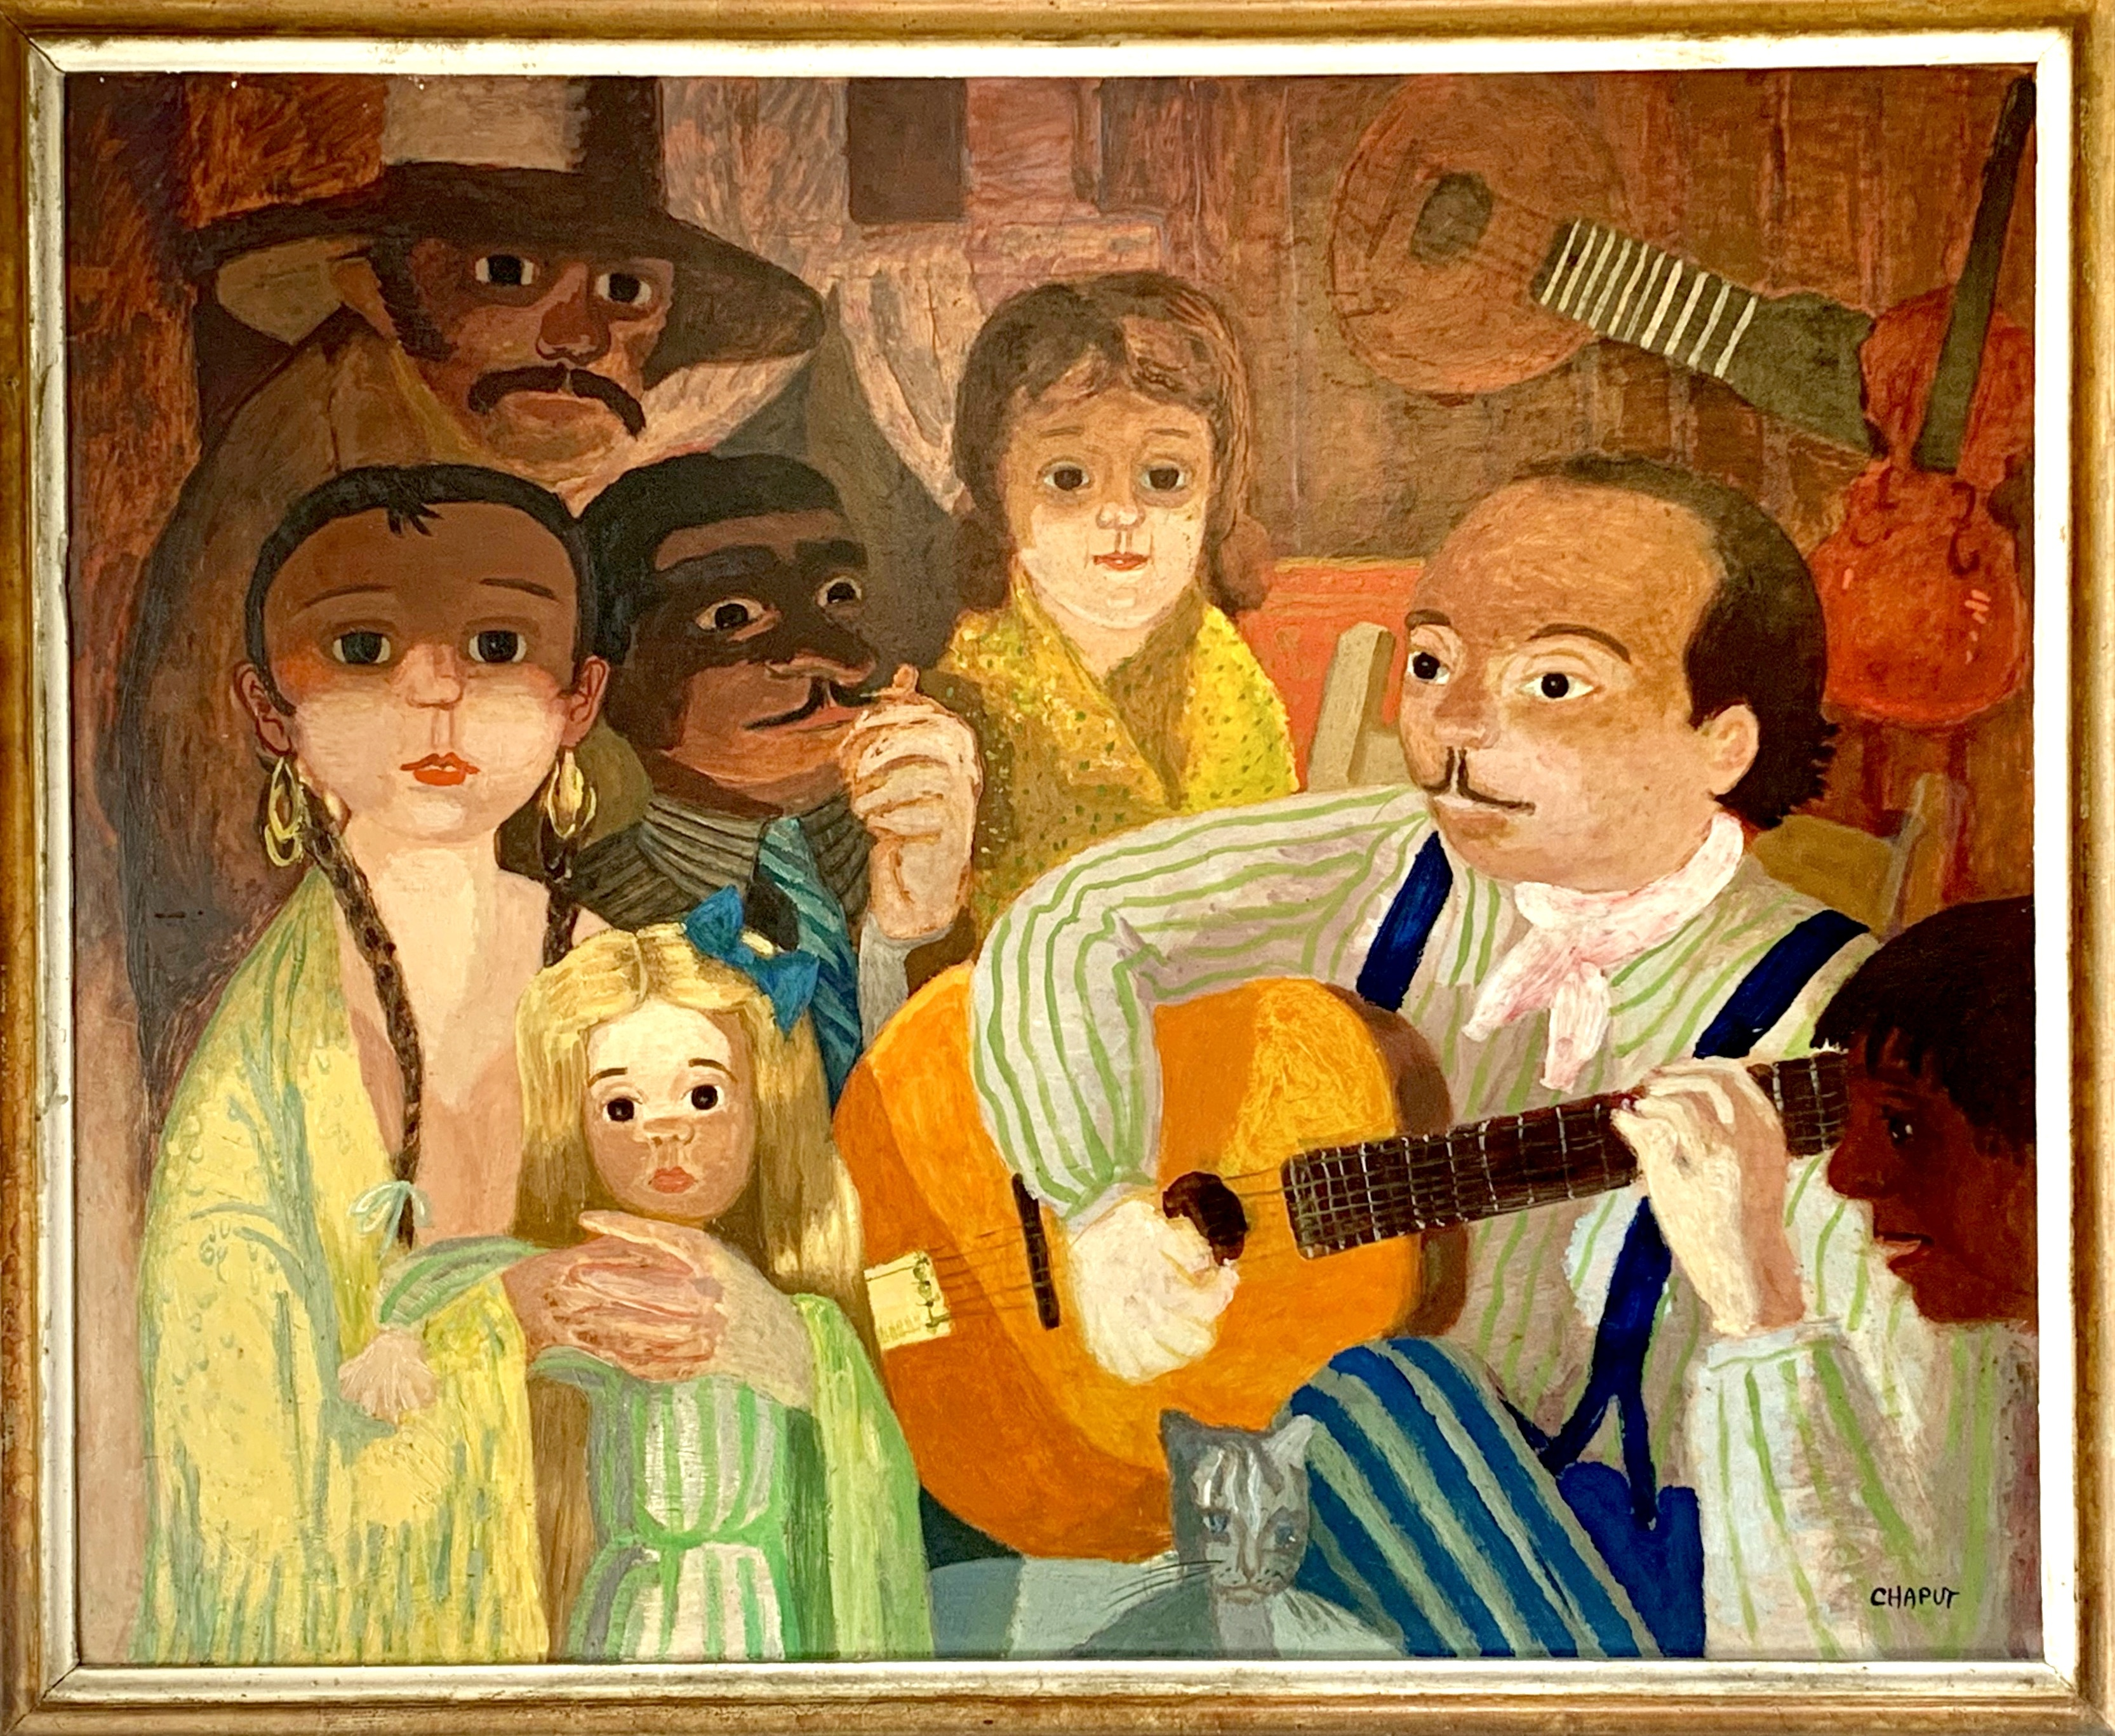 Tableau Roger Chaput Django en famille - collection Jean-Marc Soro - Photo retouchée.jpeg